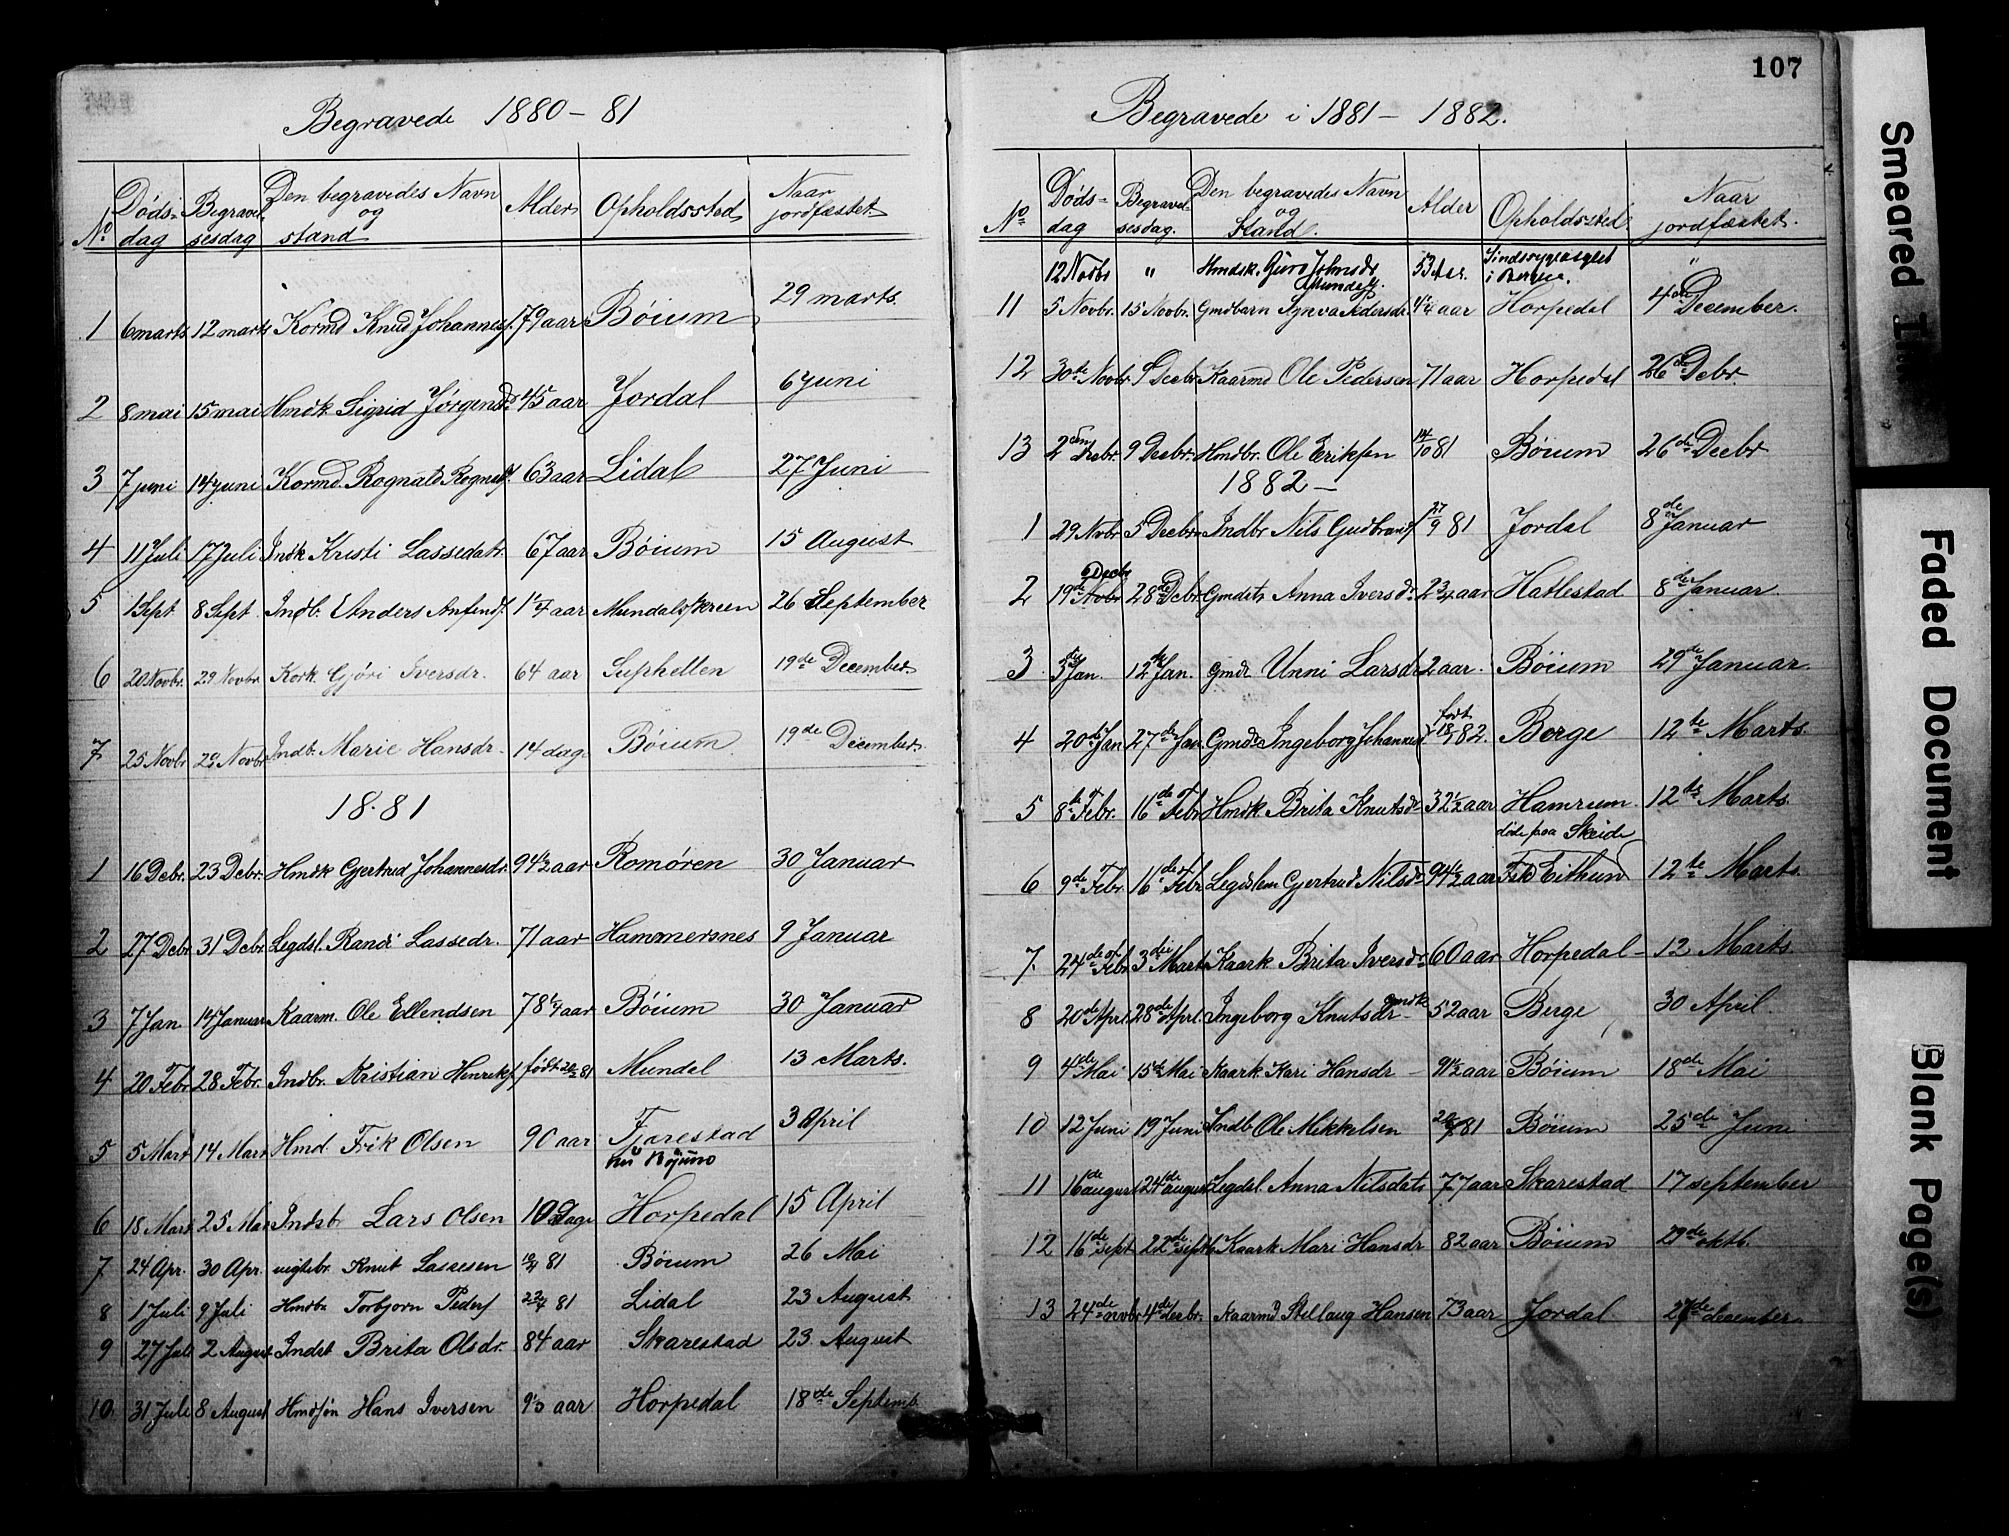 SAB, Balestrand sokneprestembete, Klokkerbok nr. B 1A, 1880-1916, s. 107